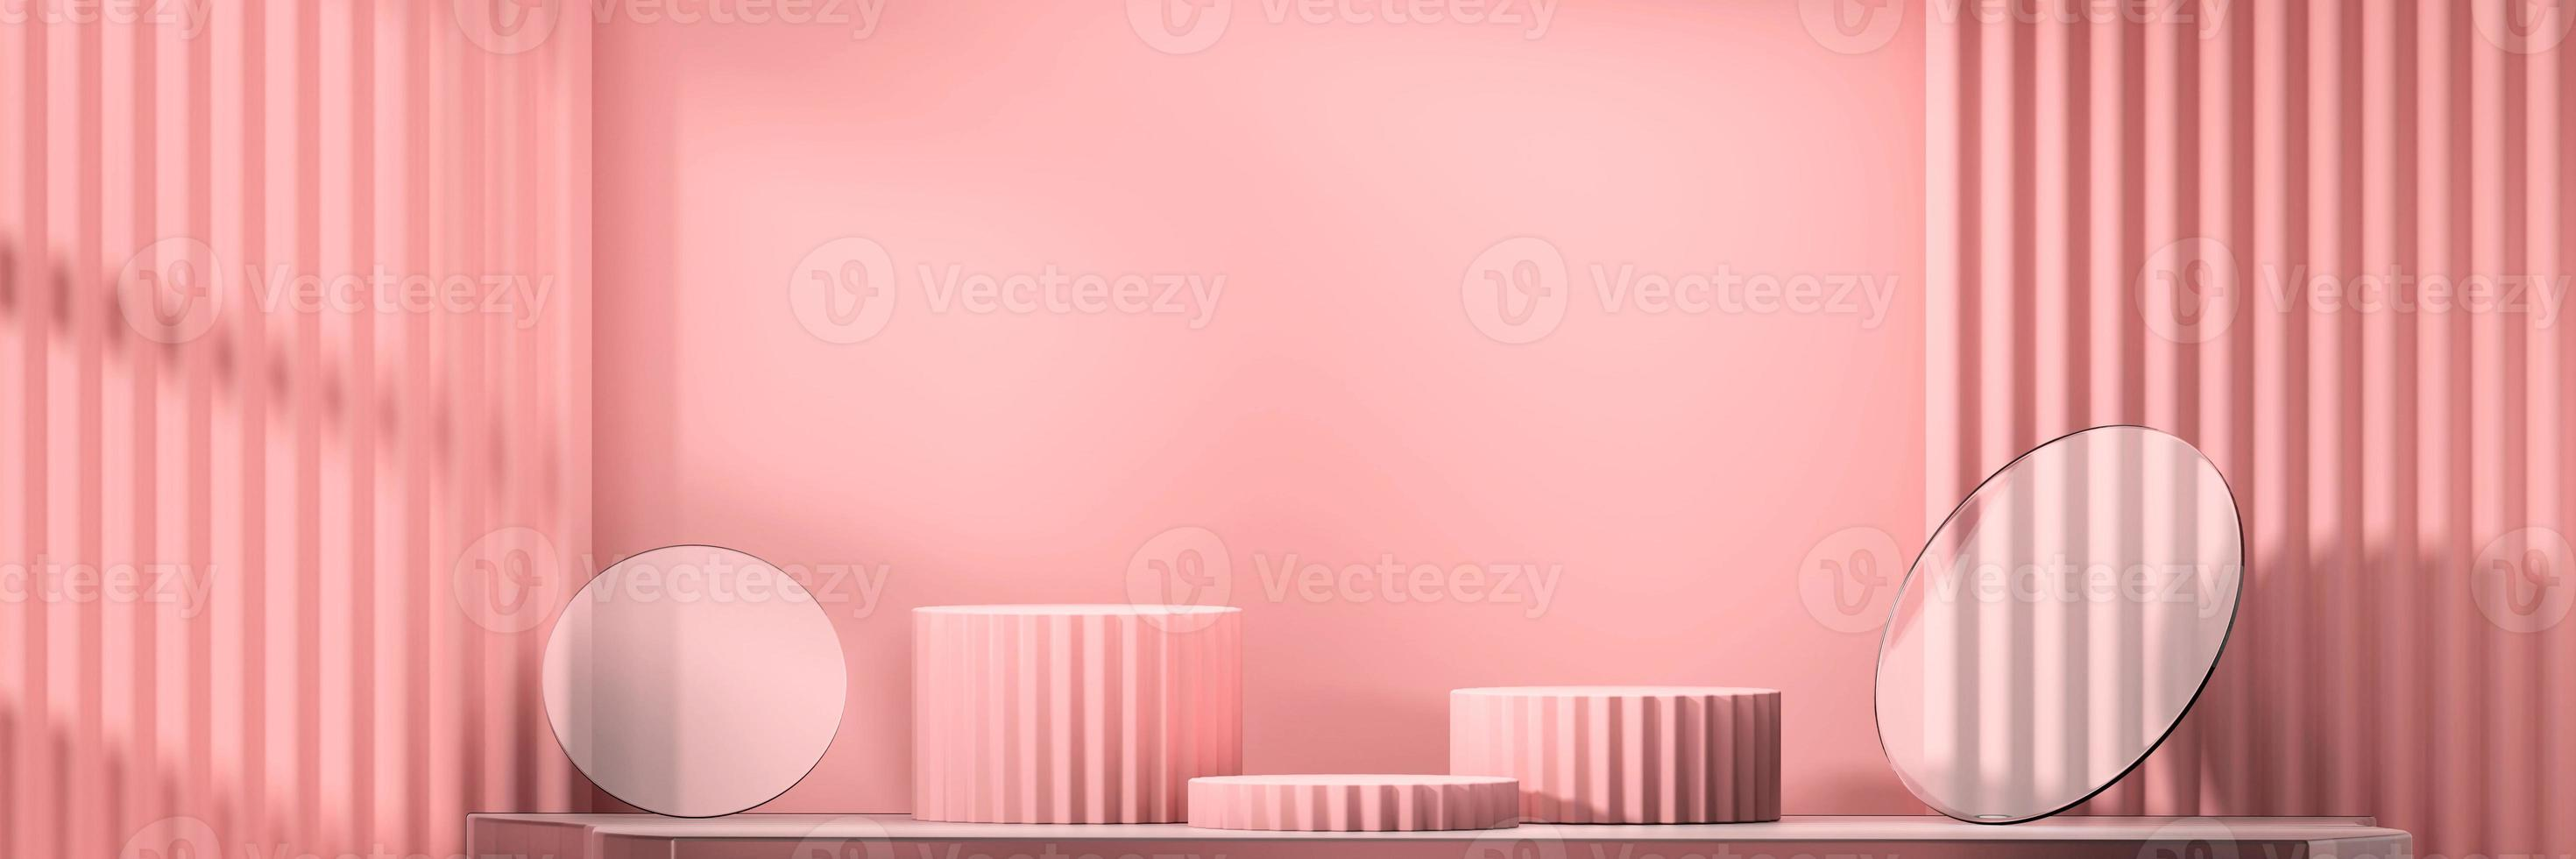 abstract podium podium mockup foto